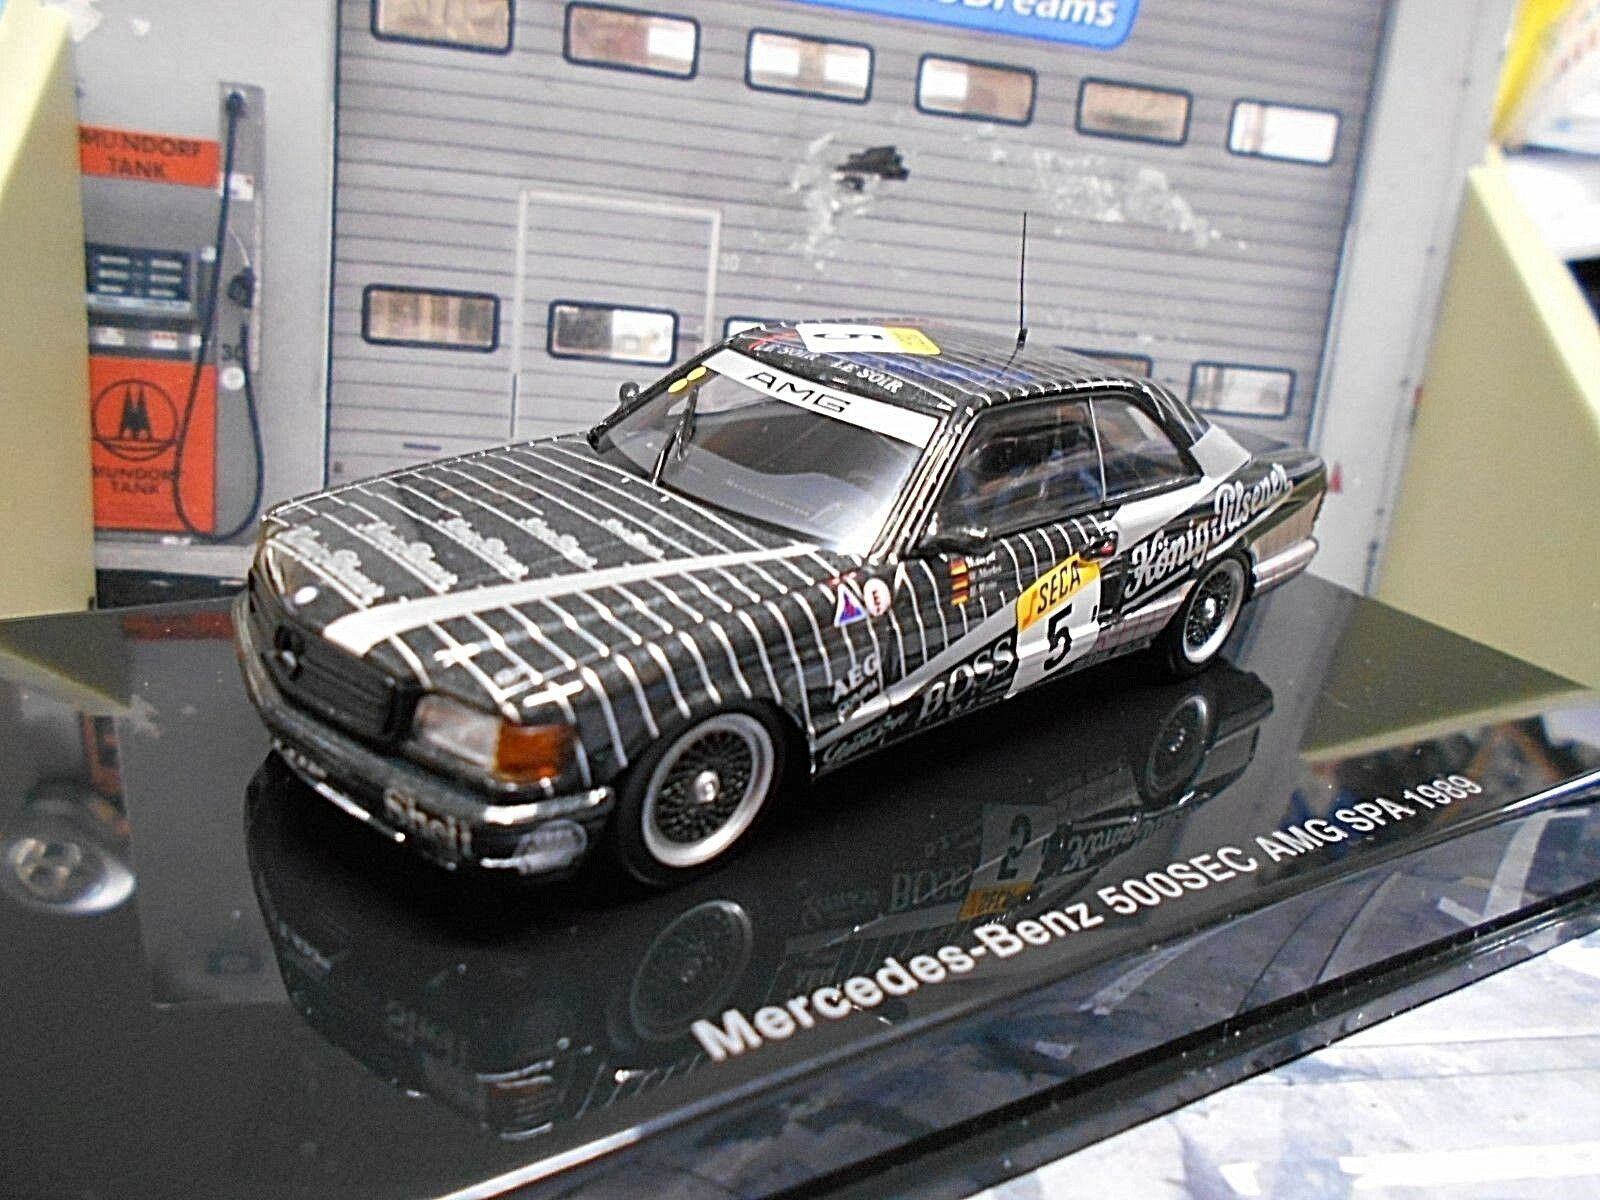 Mercedes Benz 500 SEC Roi Pilsener AMG 24 H Spa  5 1989 Heyer c126 AUTOART 1 43